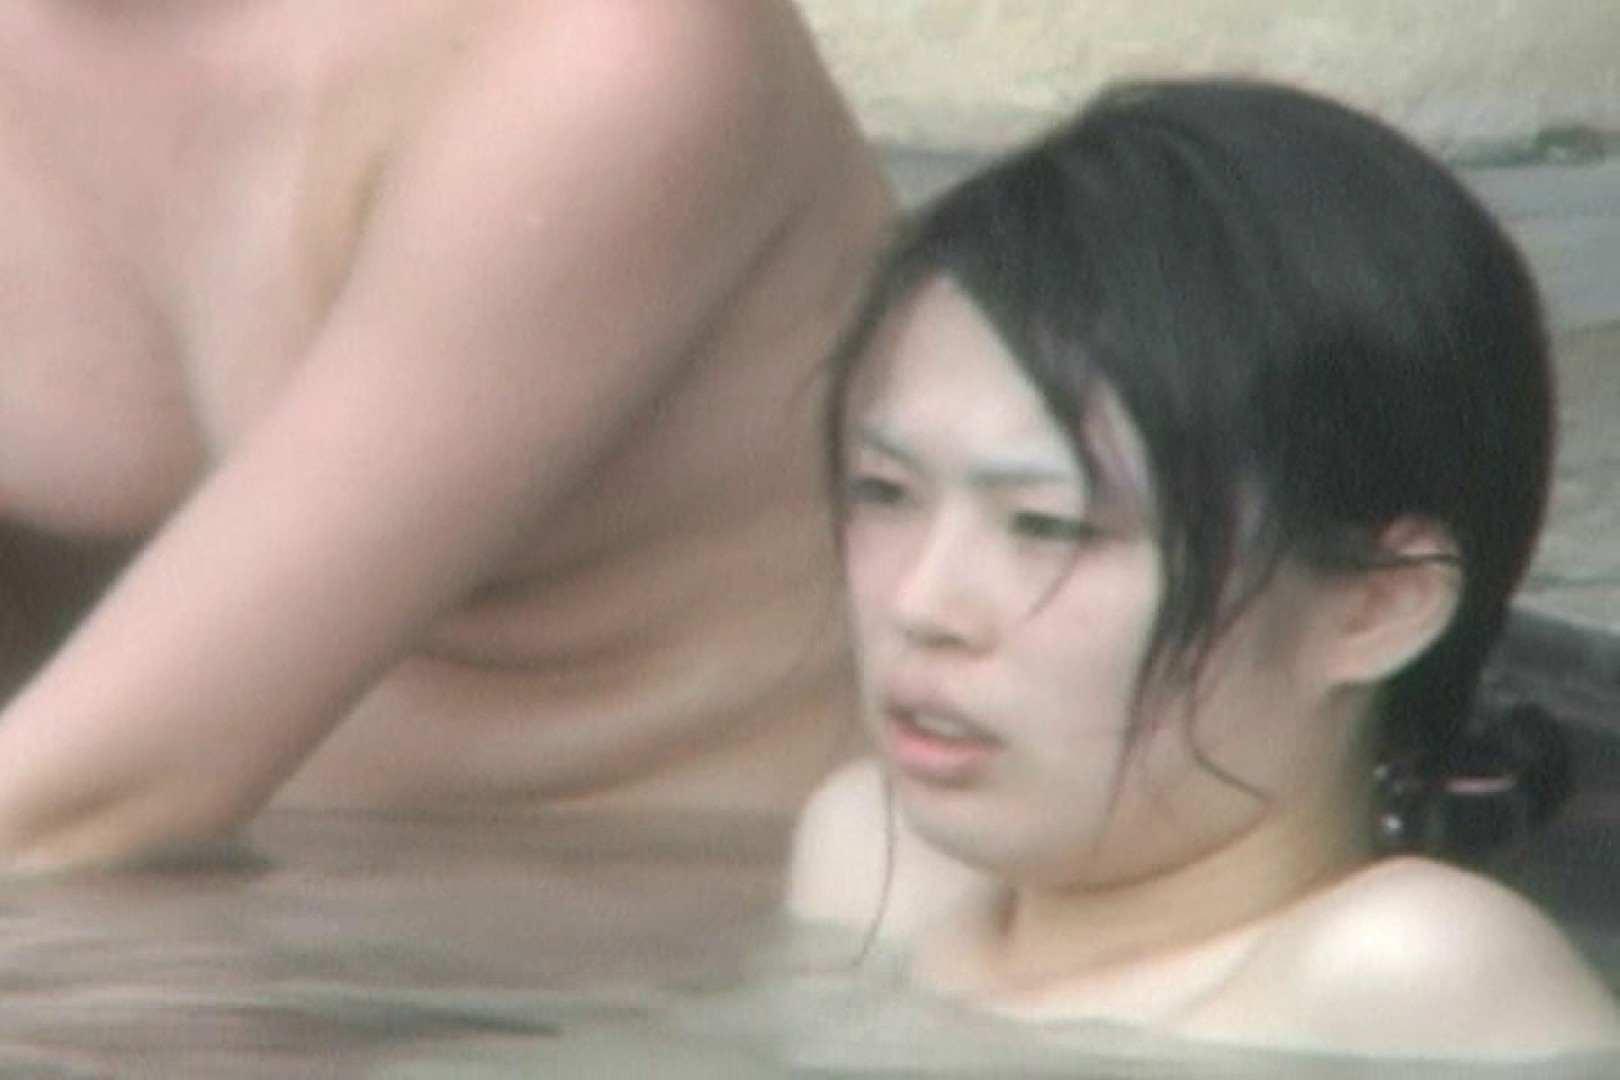 Aquaな露天風呂Vol.593 美しいOLの裸体 | 露天風呂突入  83pic 64